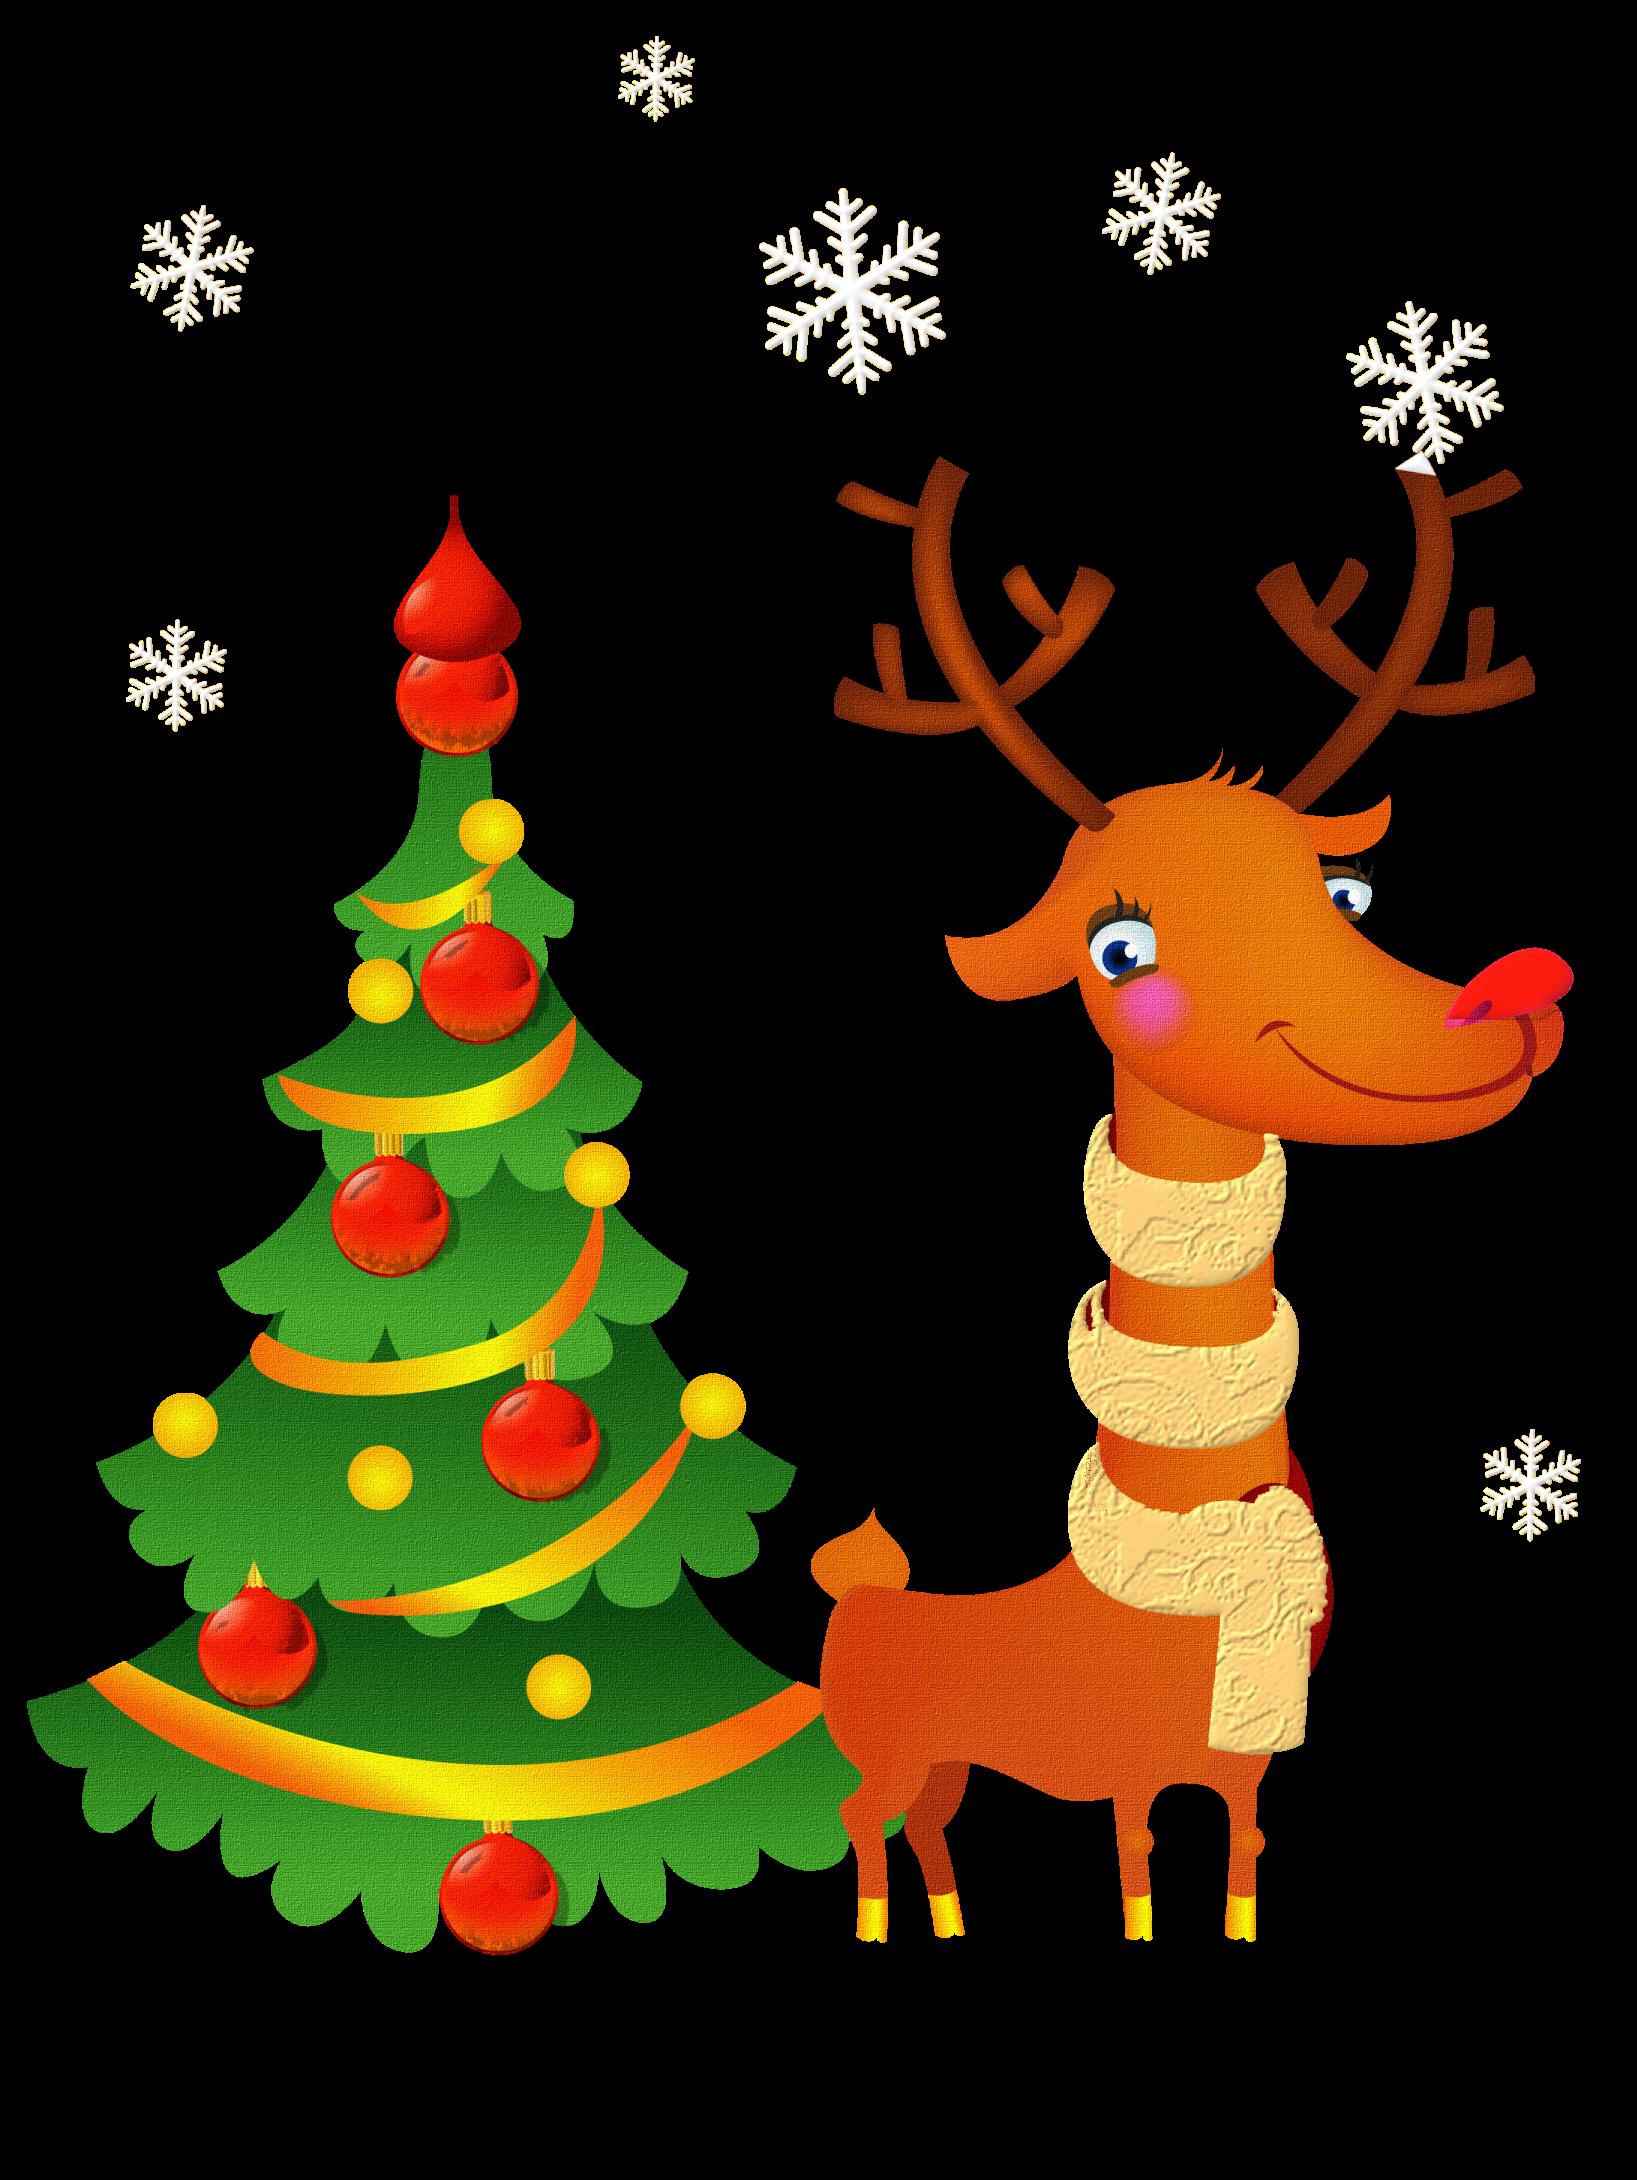 Christmas pine tree ve geyik